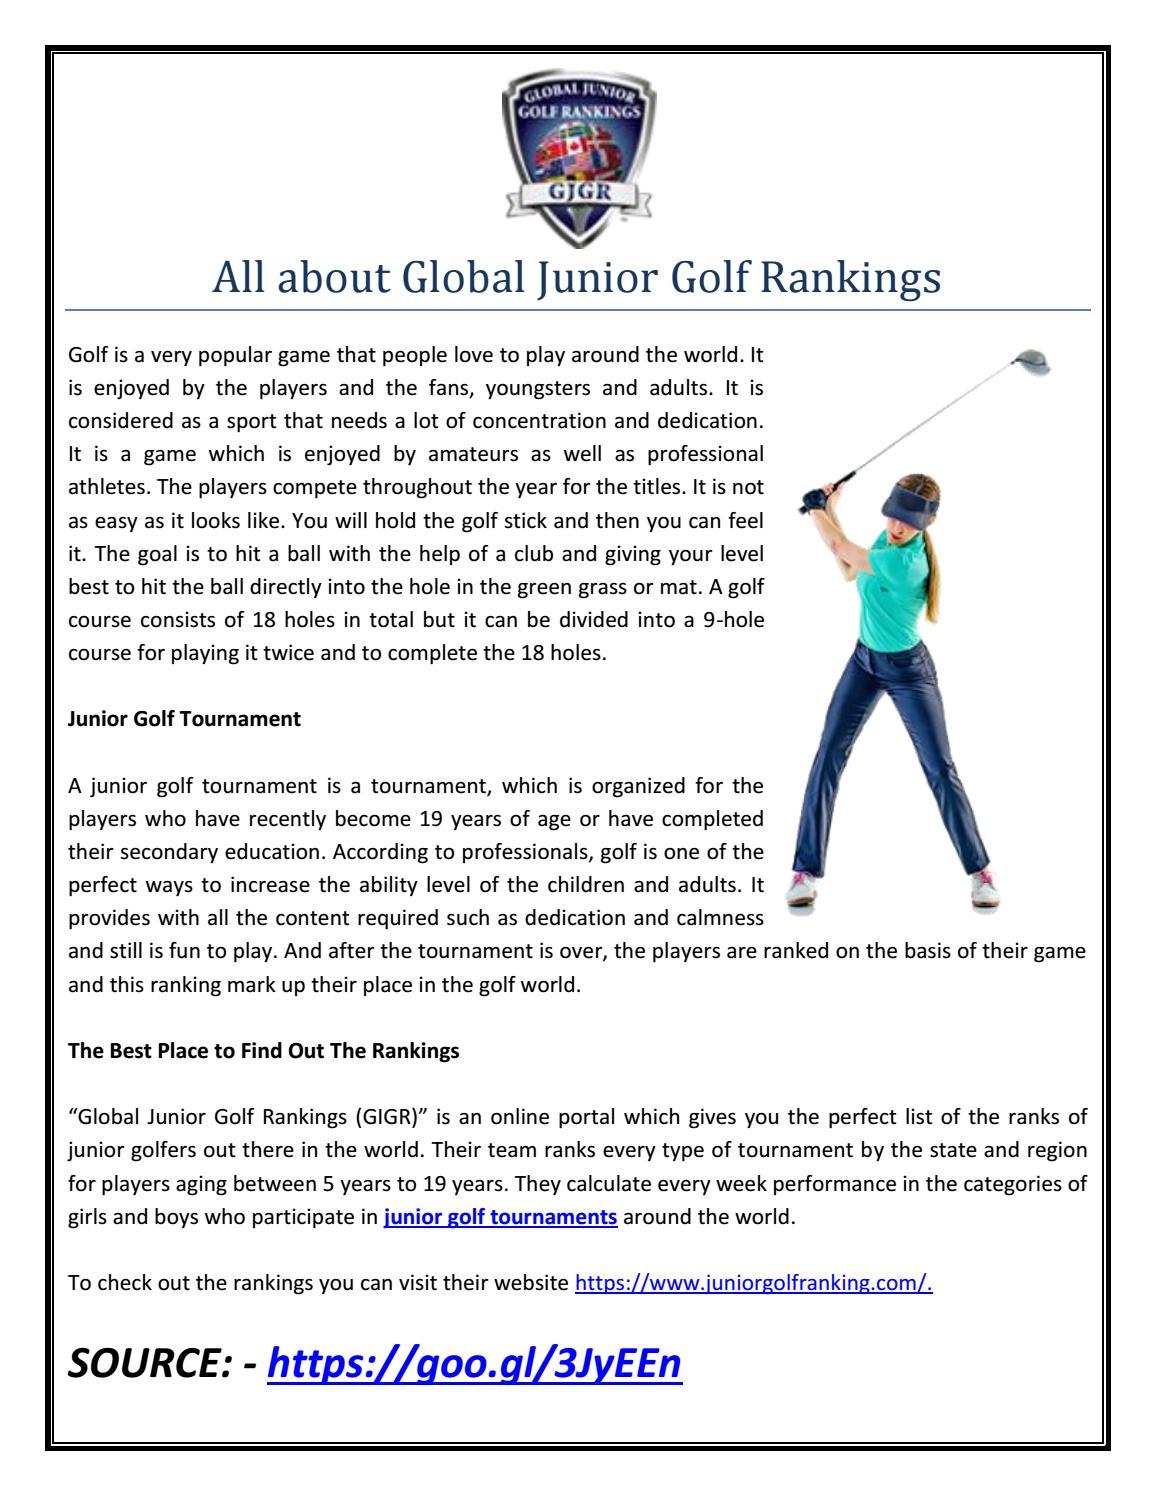 All About Global Junior Golf Rankings By Digital Marketing Issuu